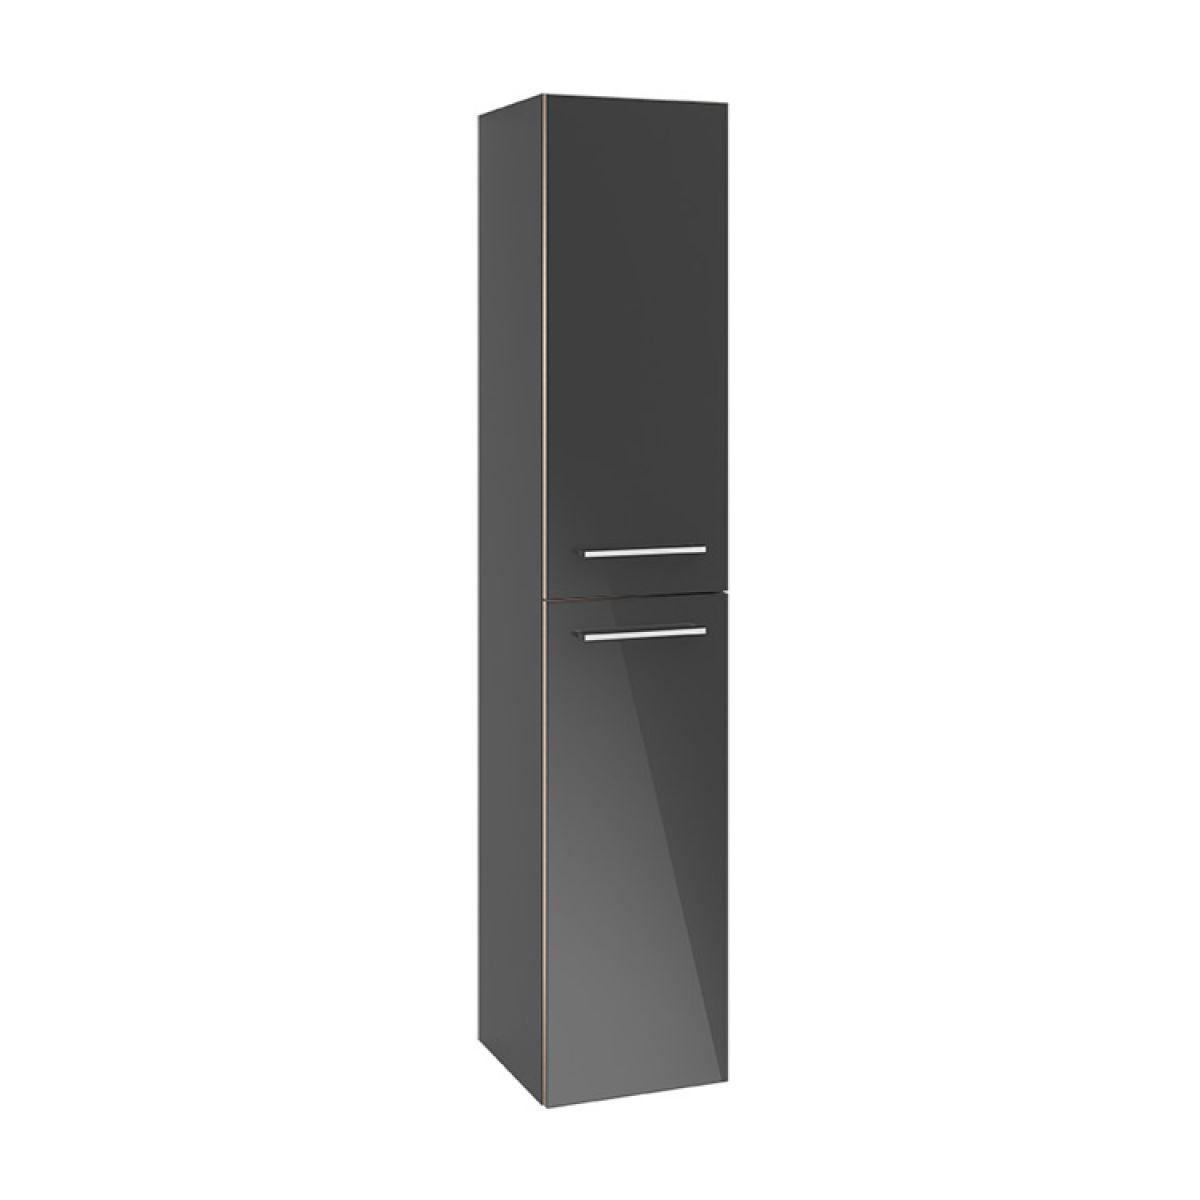 villeroy boch avento tall cabinet uk bathrooms. Black Bedroom Furniture Sets. Home Design Ideas